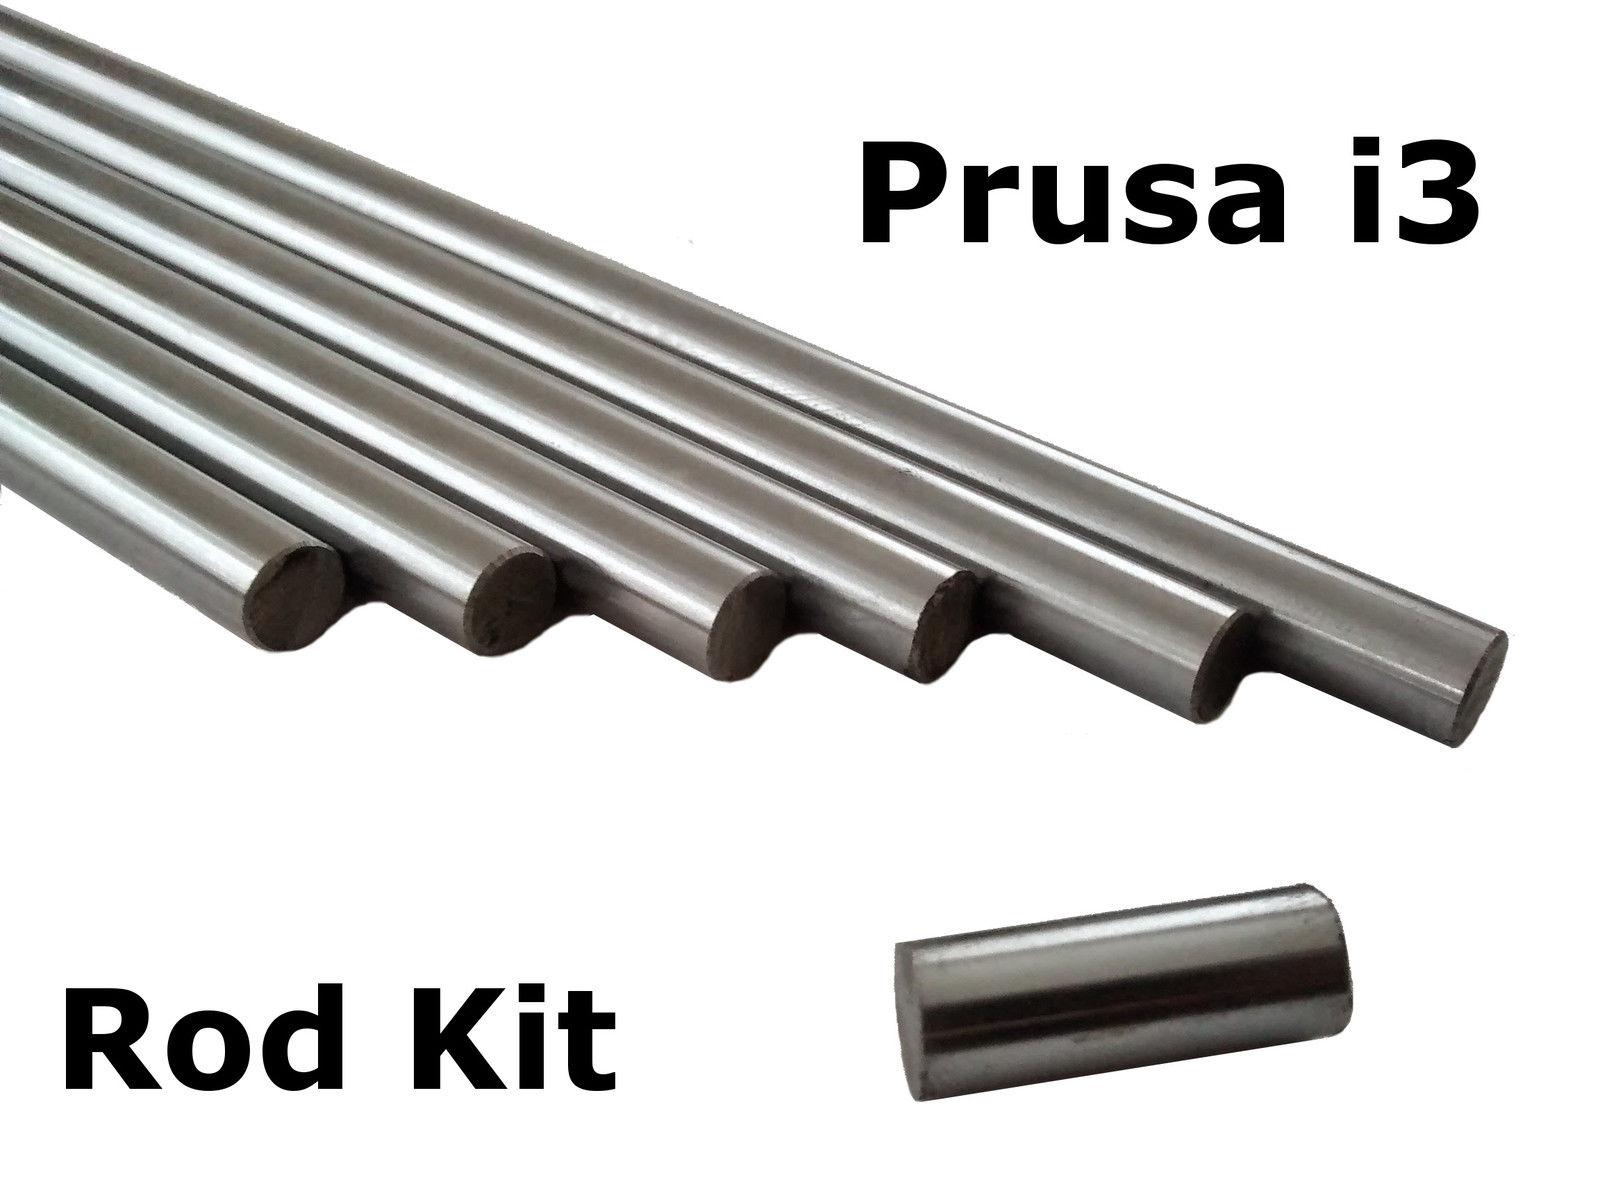 Prusa I3 3D Printer Smooth Rod Kits - 8mm Chrome Steel Smooth Rod L 20mm 320mm 350mm 370mm Linear Shaft Optical Axis - RepRap